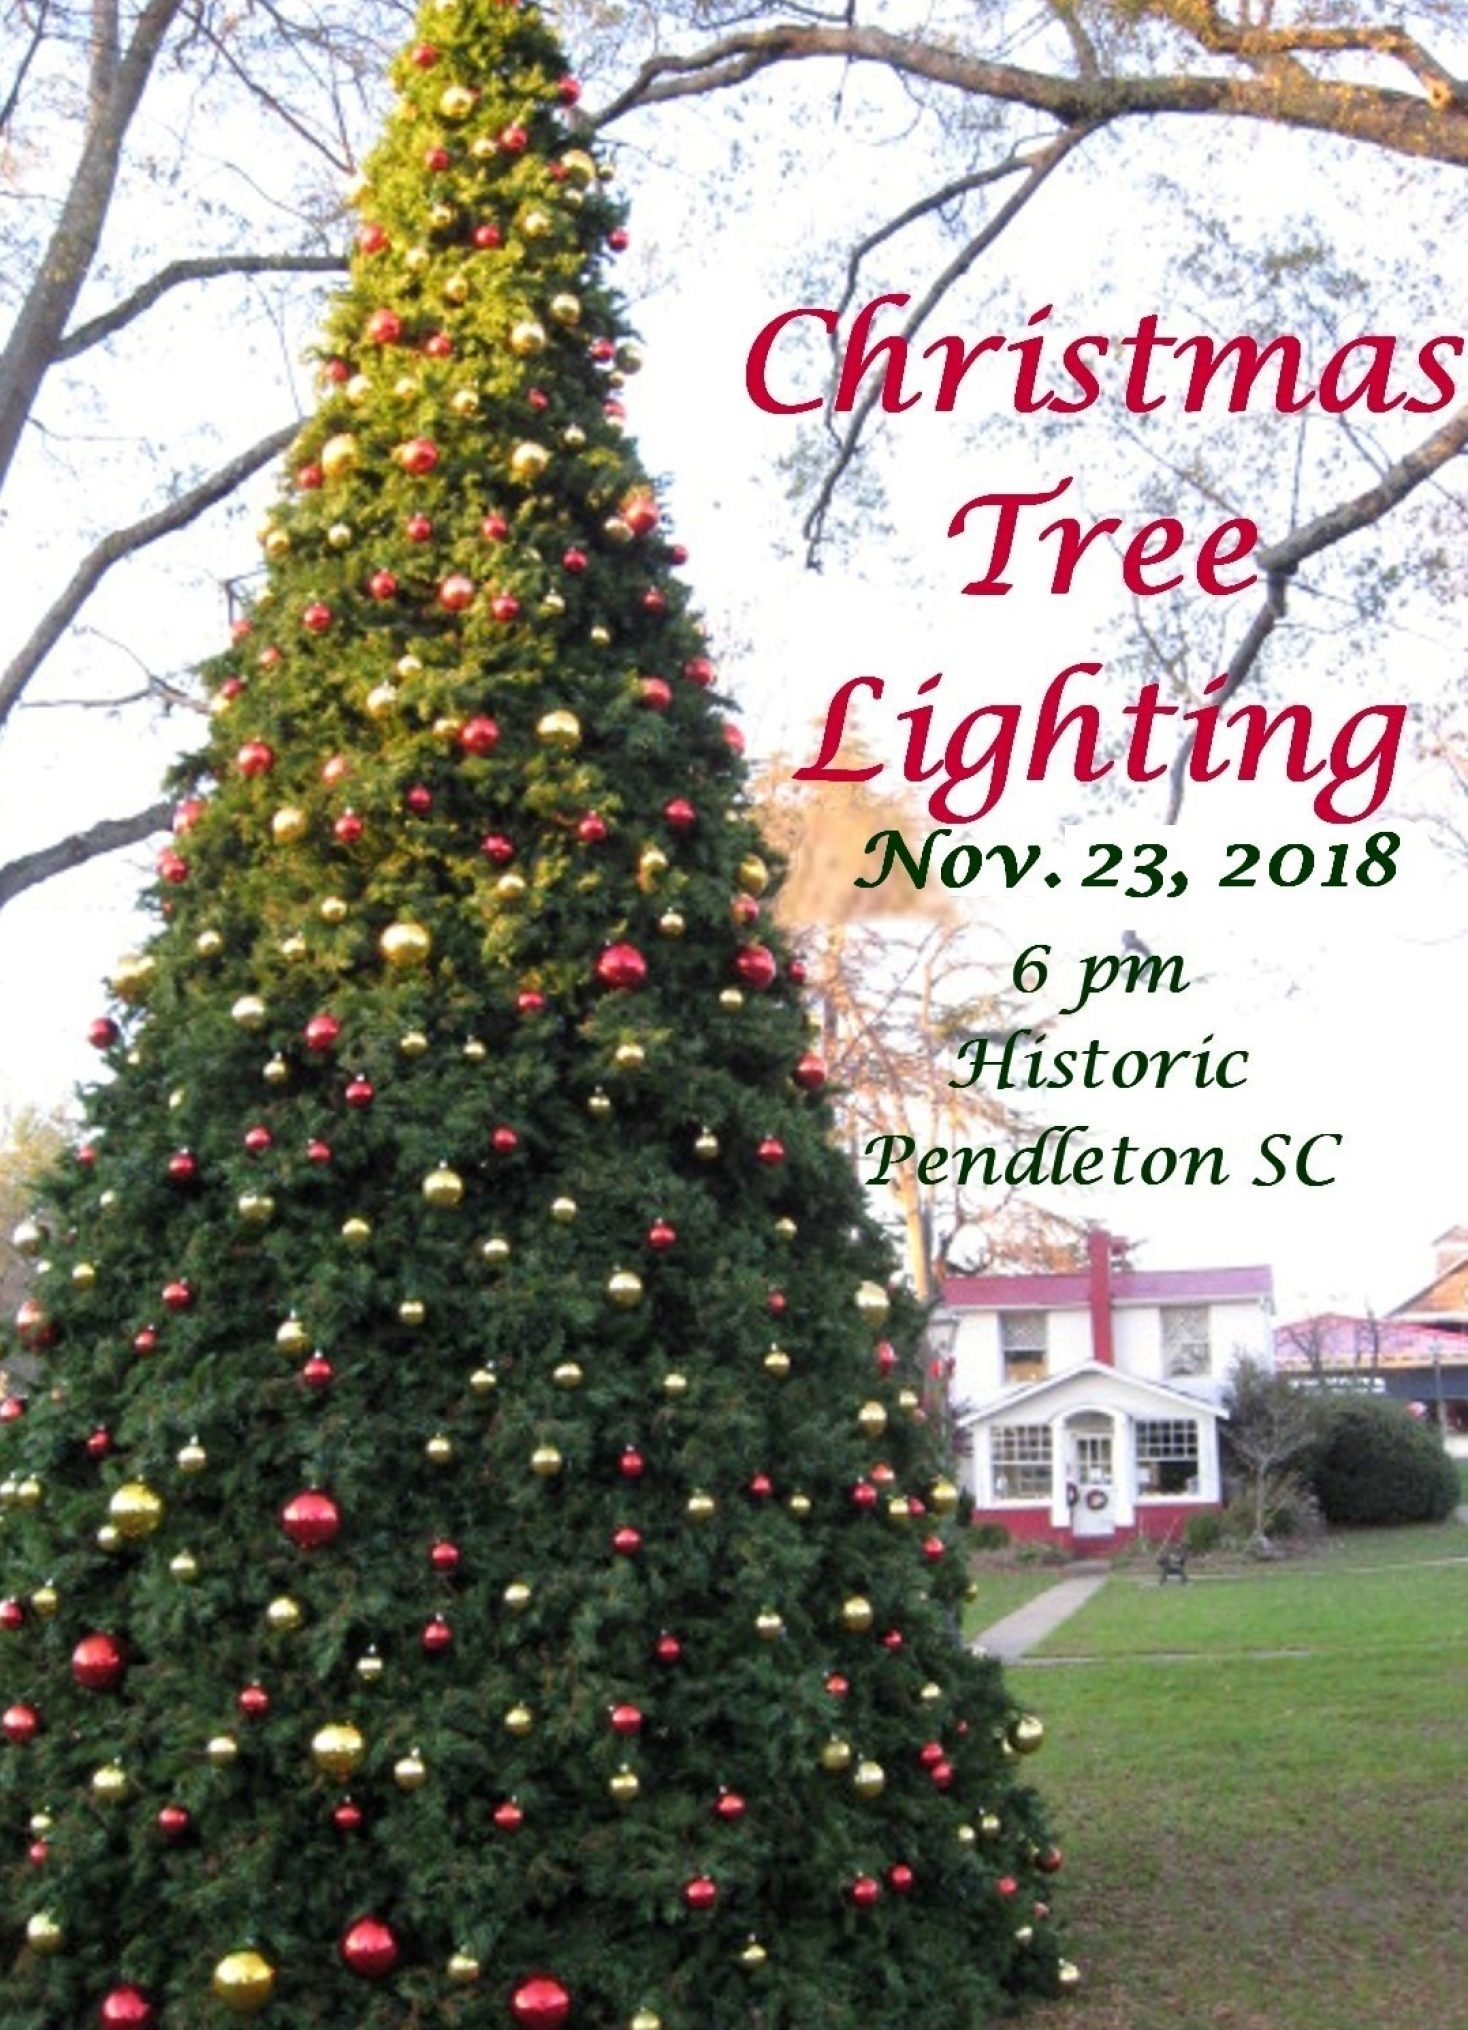 Annual Lighting of the Christmas Tree